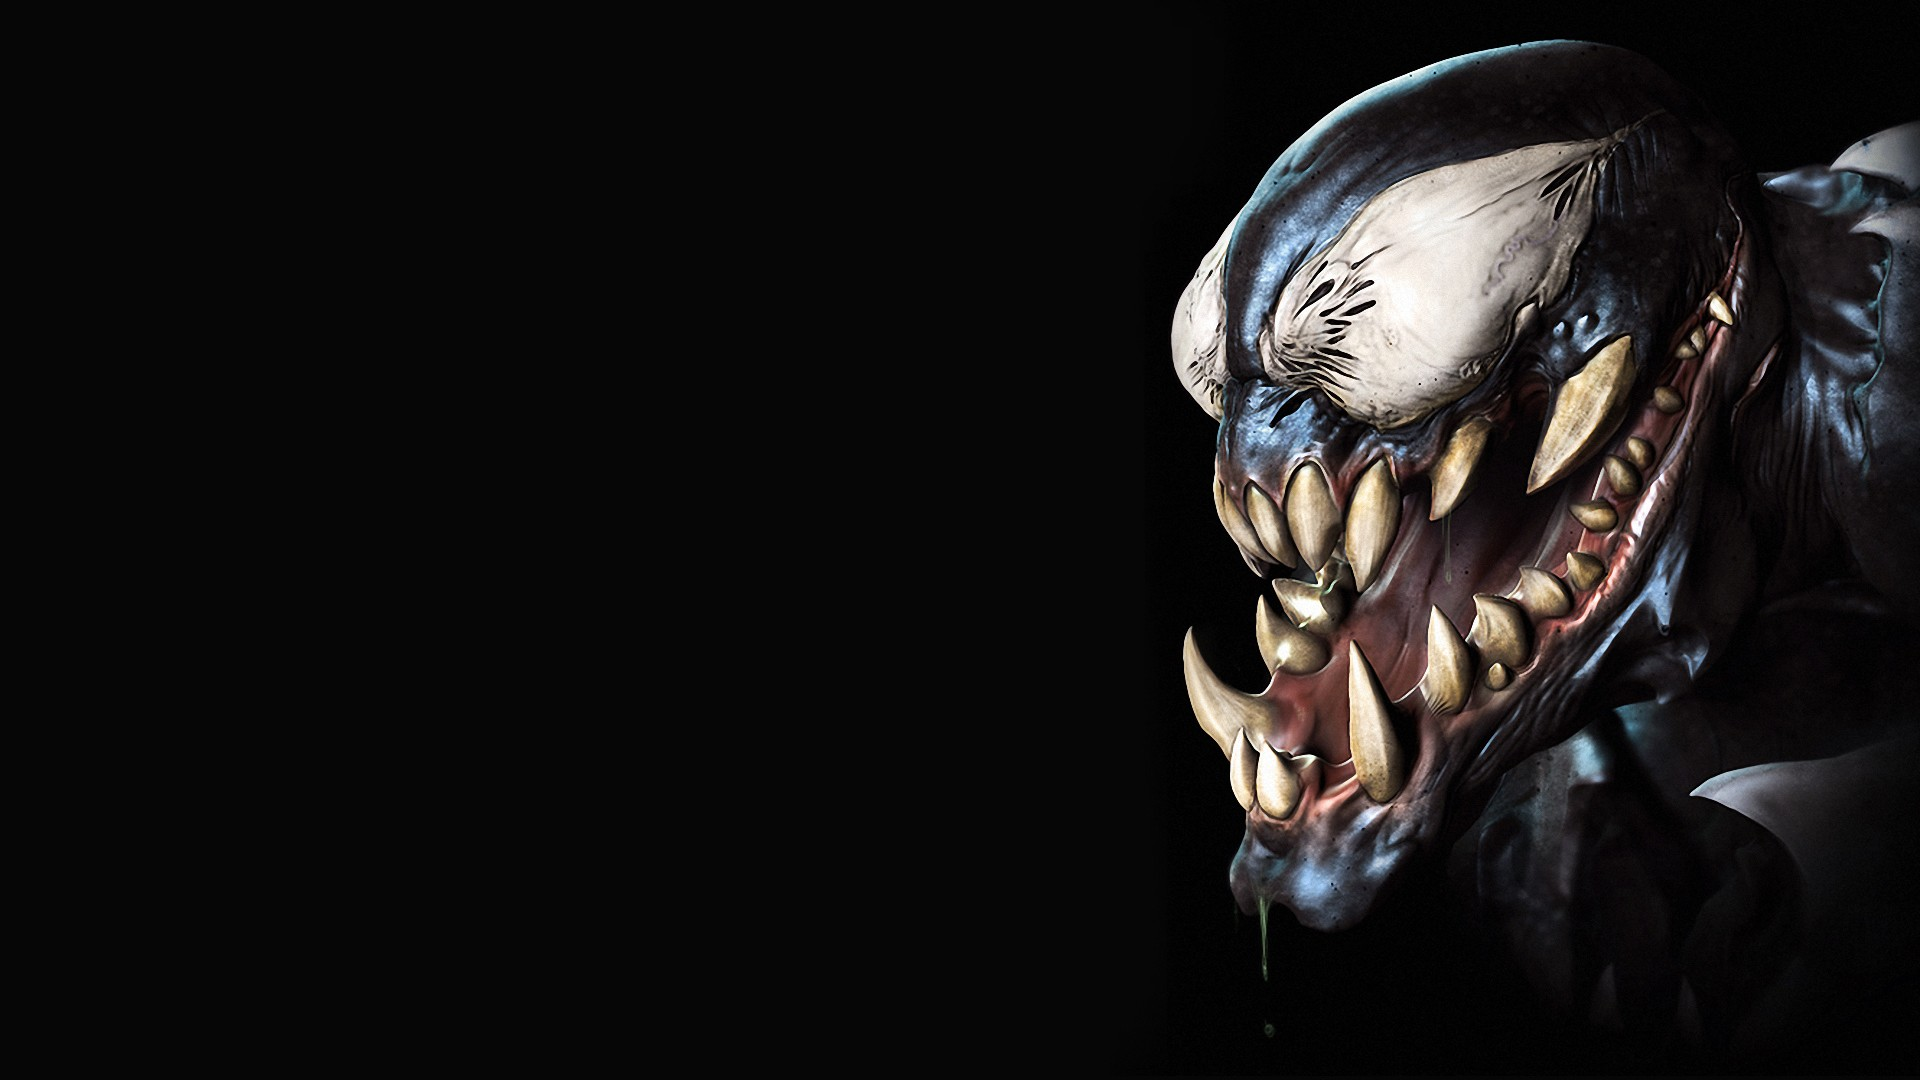 Download Venom Artwork Wallpaper 1920x1080 Wallpoper 422992 1920x1080